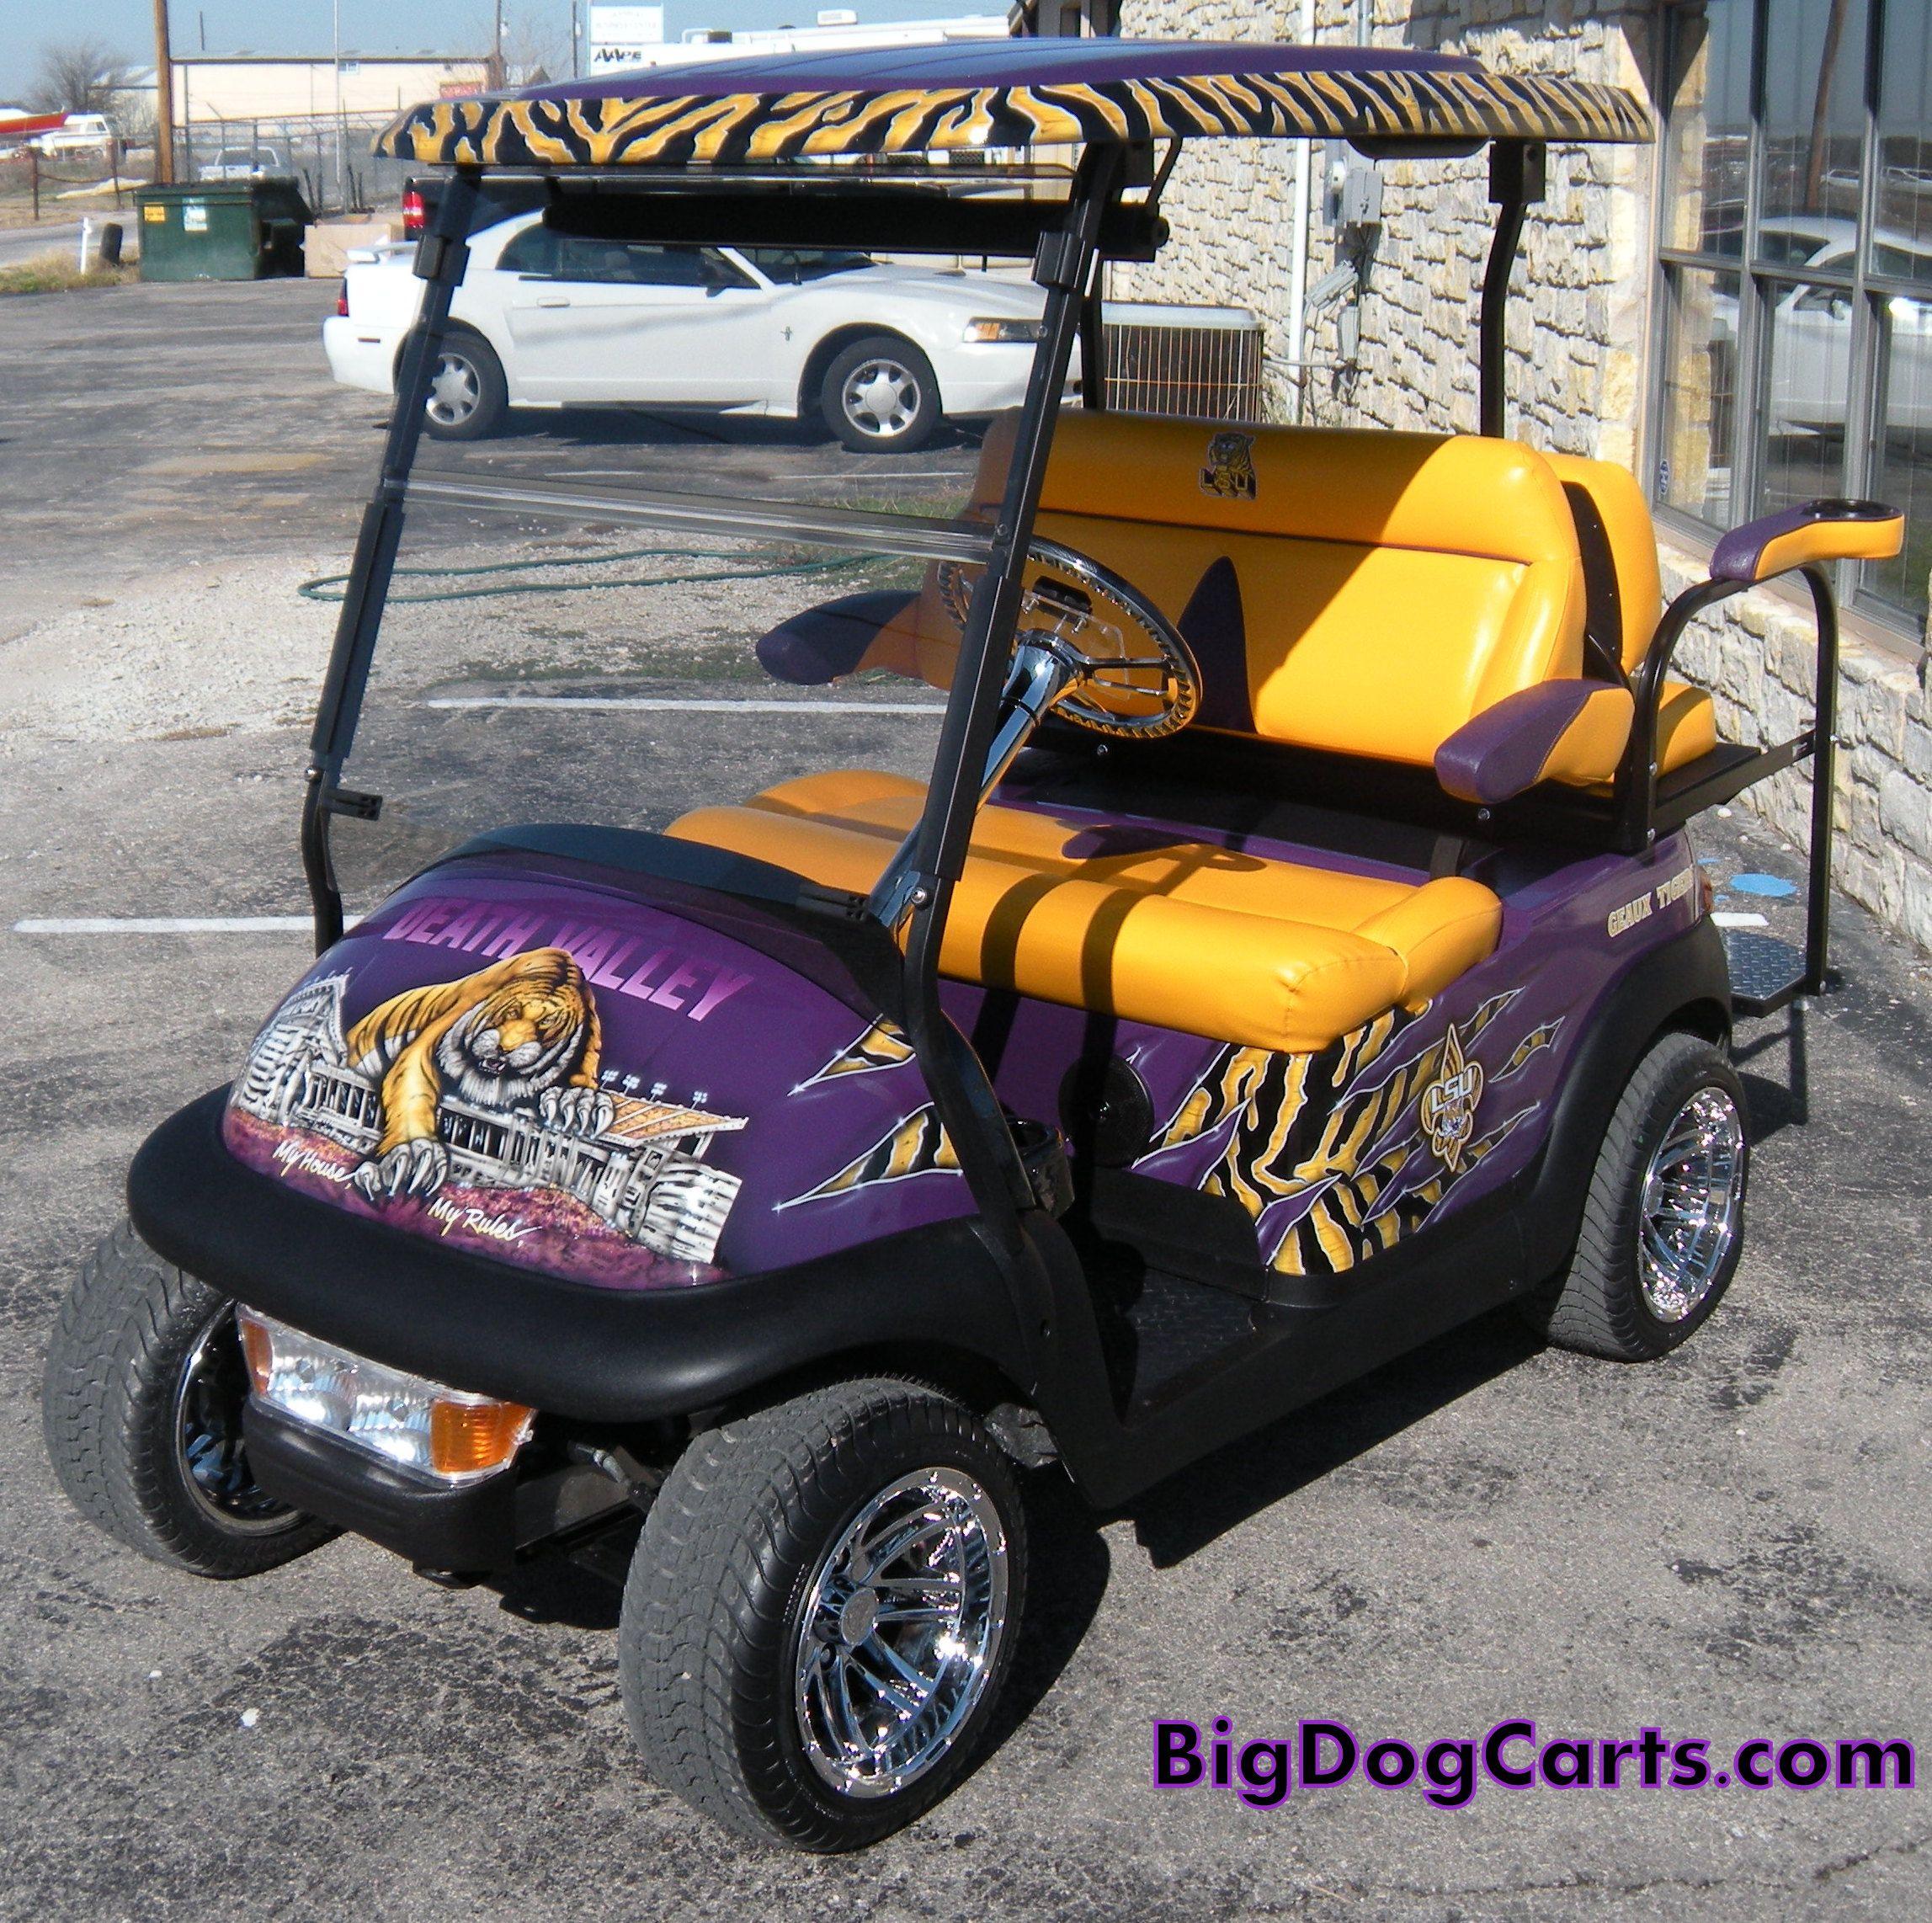 LSU Tigers cart. Built on a Club Car Precedent. This is one killer on lsu university, lsu wagon, lsu women's gymnastics, lsu sorority houses, lsu iphone wallpaper, lsu men's soccer, lsu tool box, lsu pants, lsu college football, lsu body paint, car cart, lsu texas a&m, lsu memes, lsu dorms, lsu men's basketball, lsu fire truck, lsu beanie, lsu swimming,